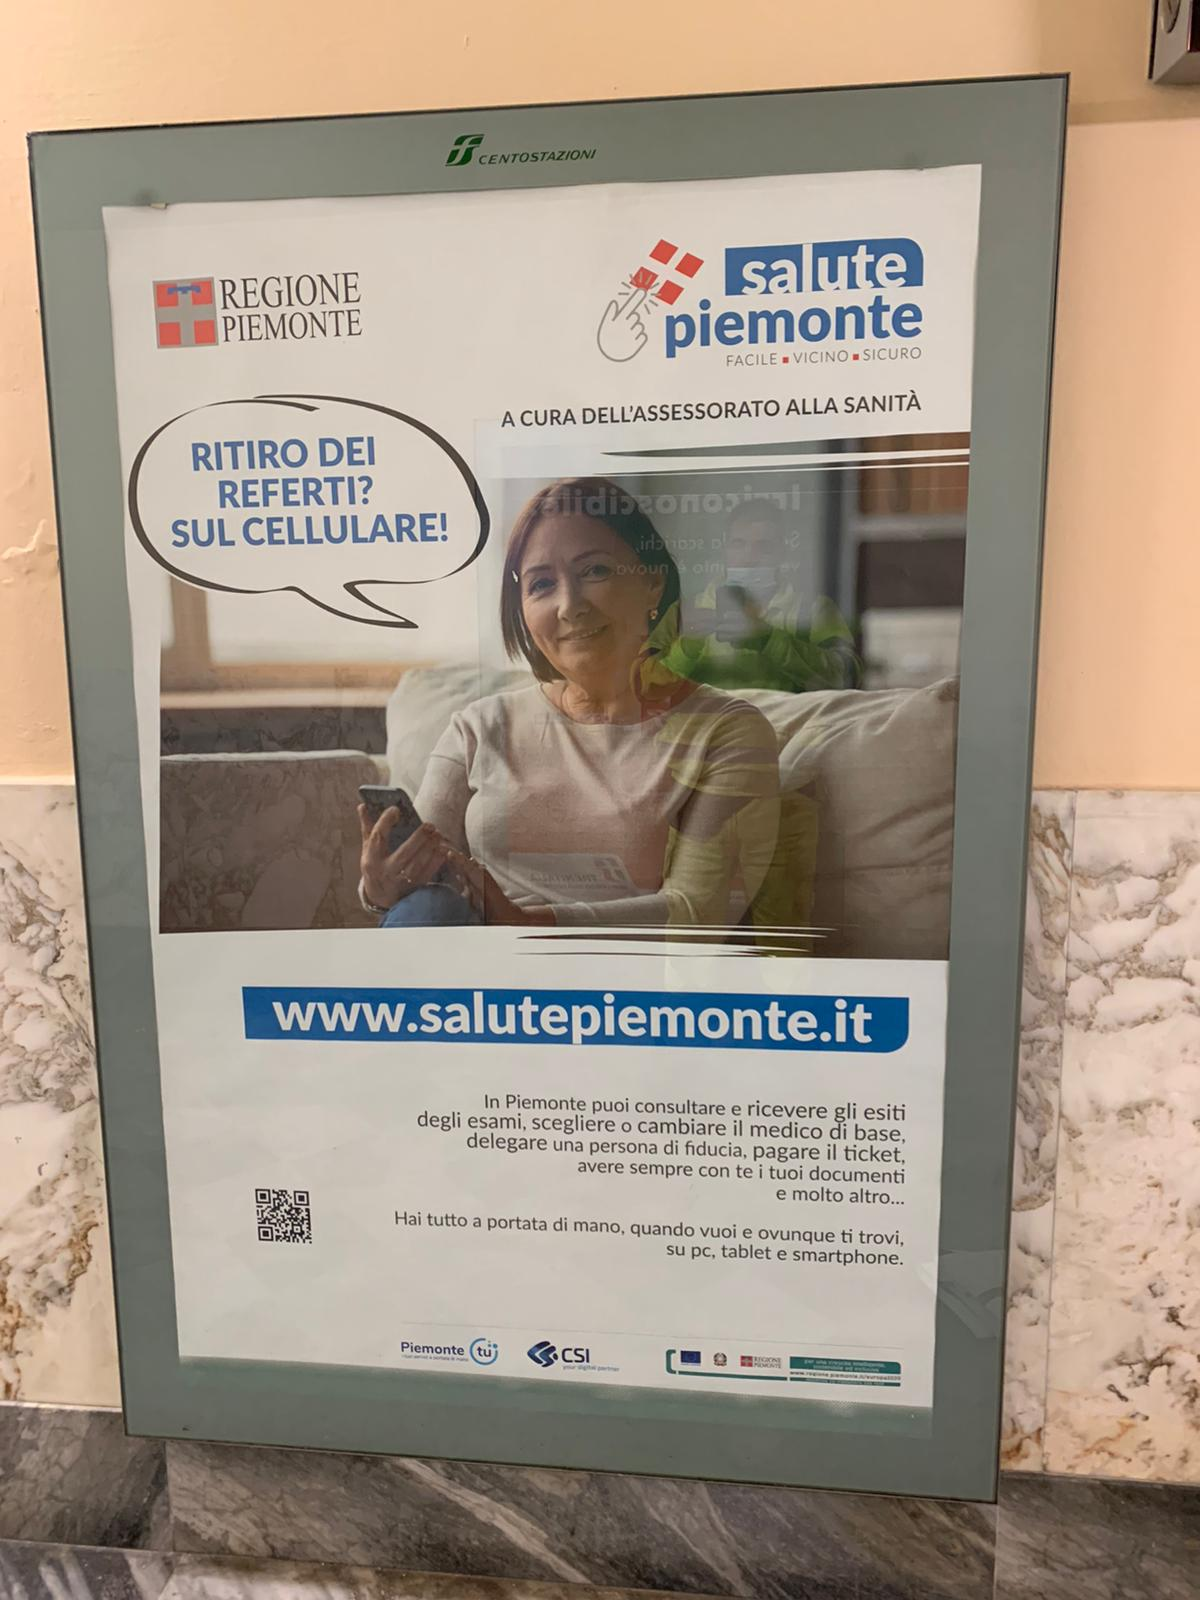 Salutepiemonte.it